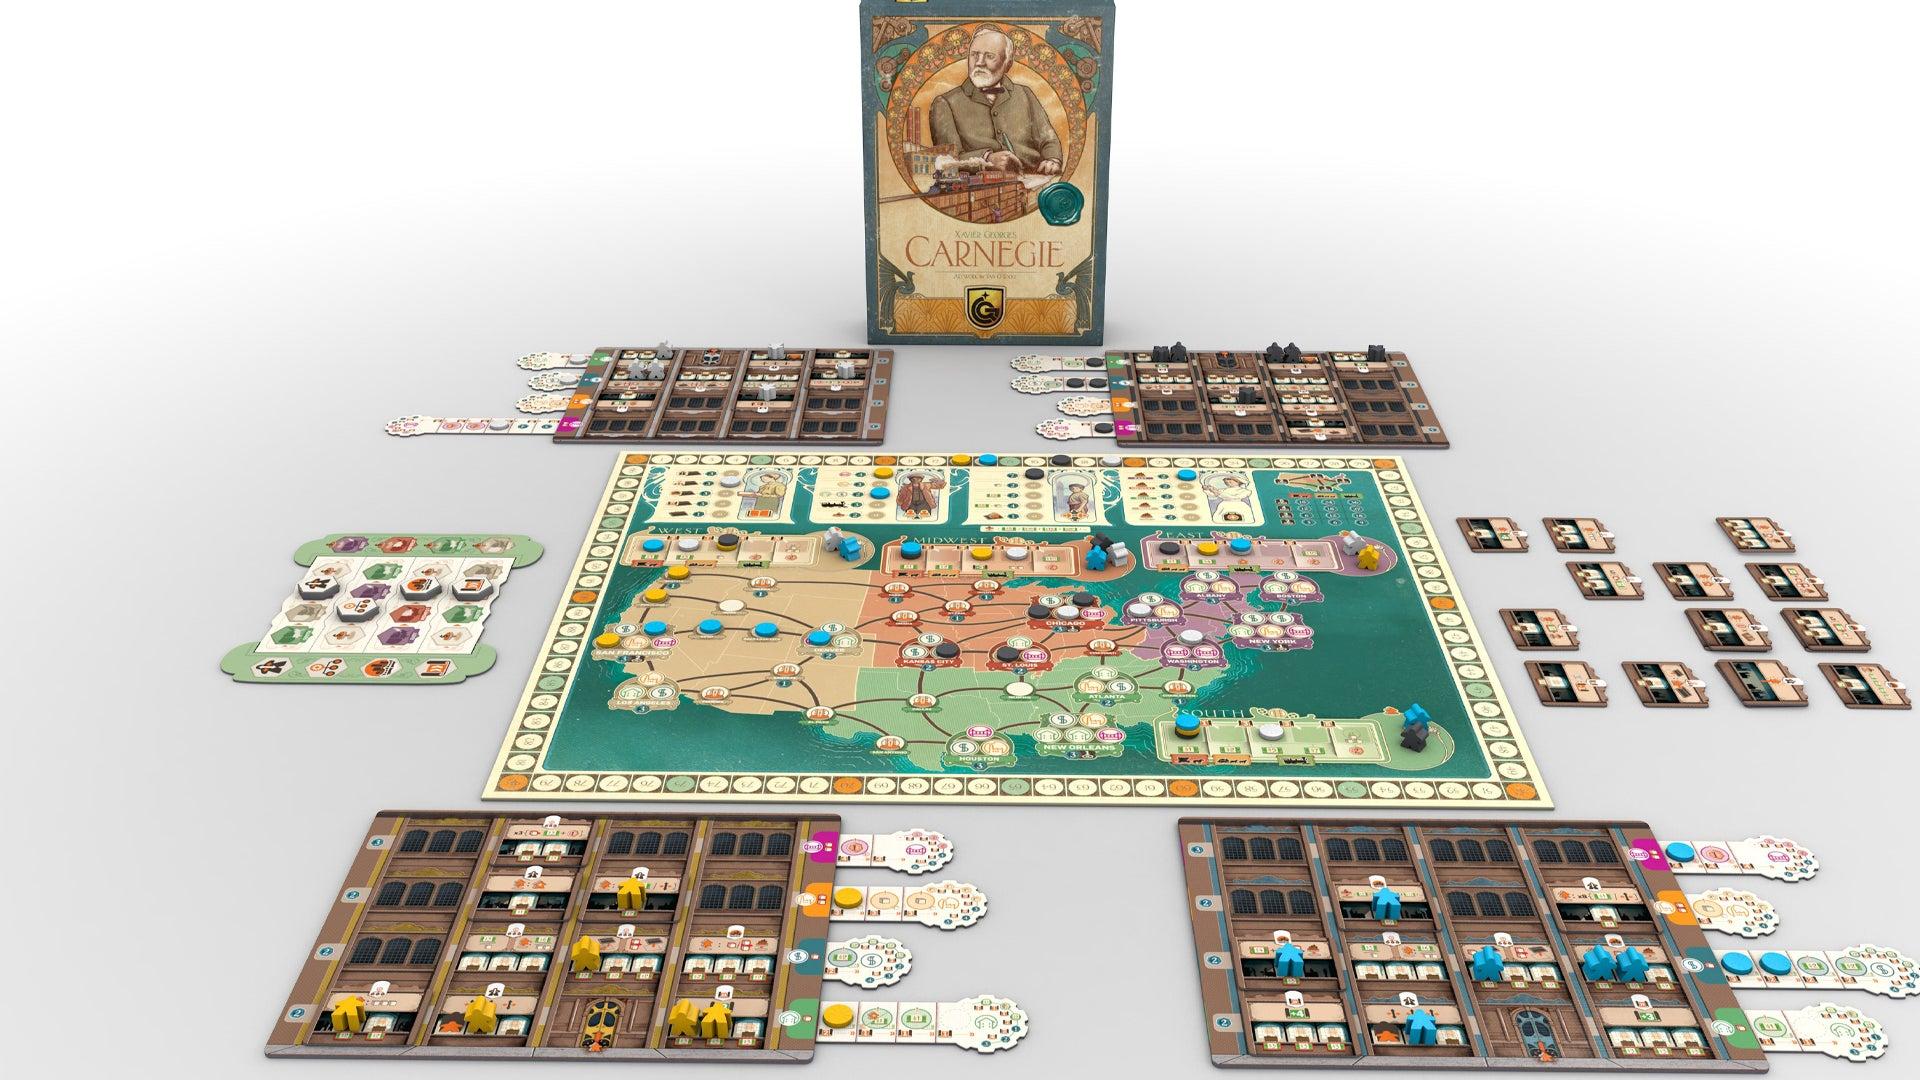 Carnegie board game layout 2